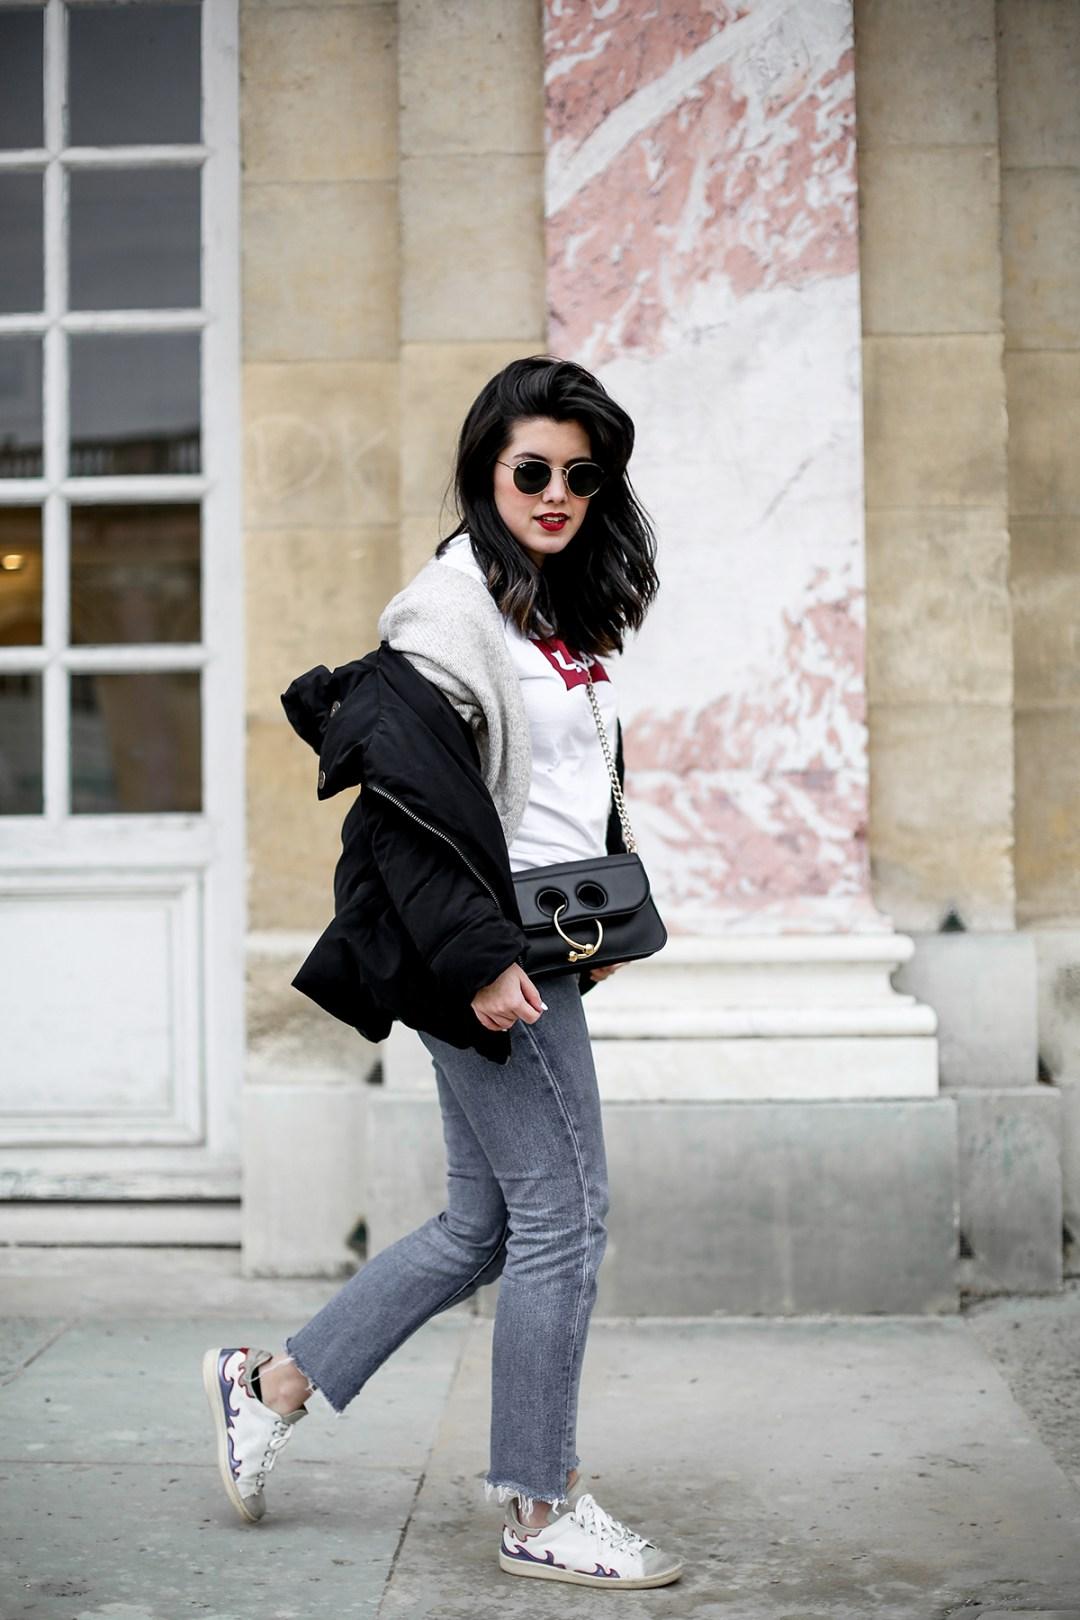 puffer-coat-levis-shirt-basic-505c-jeans-jw-anderson-pierce-bag-how-to-wear3